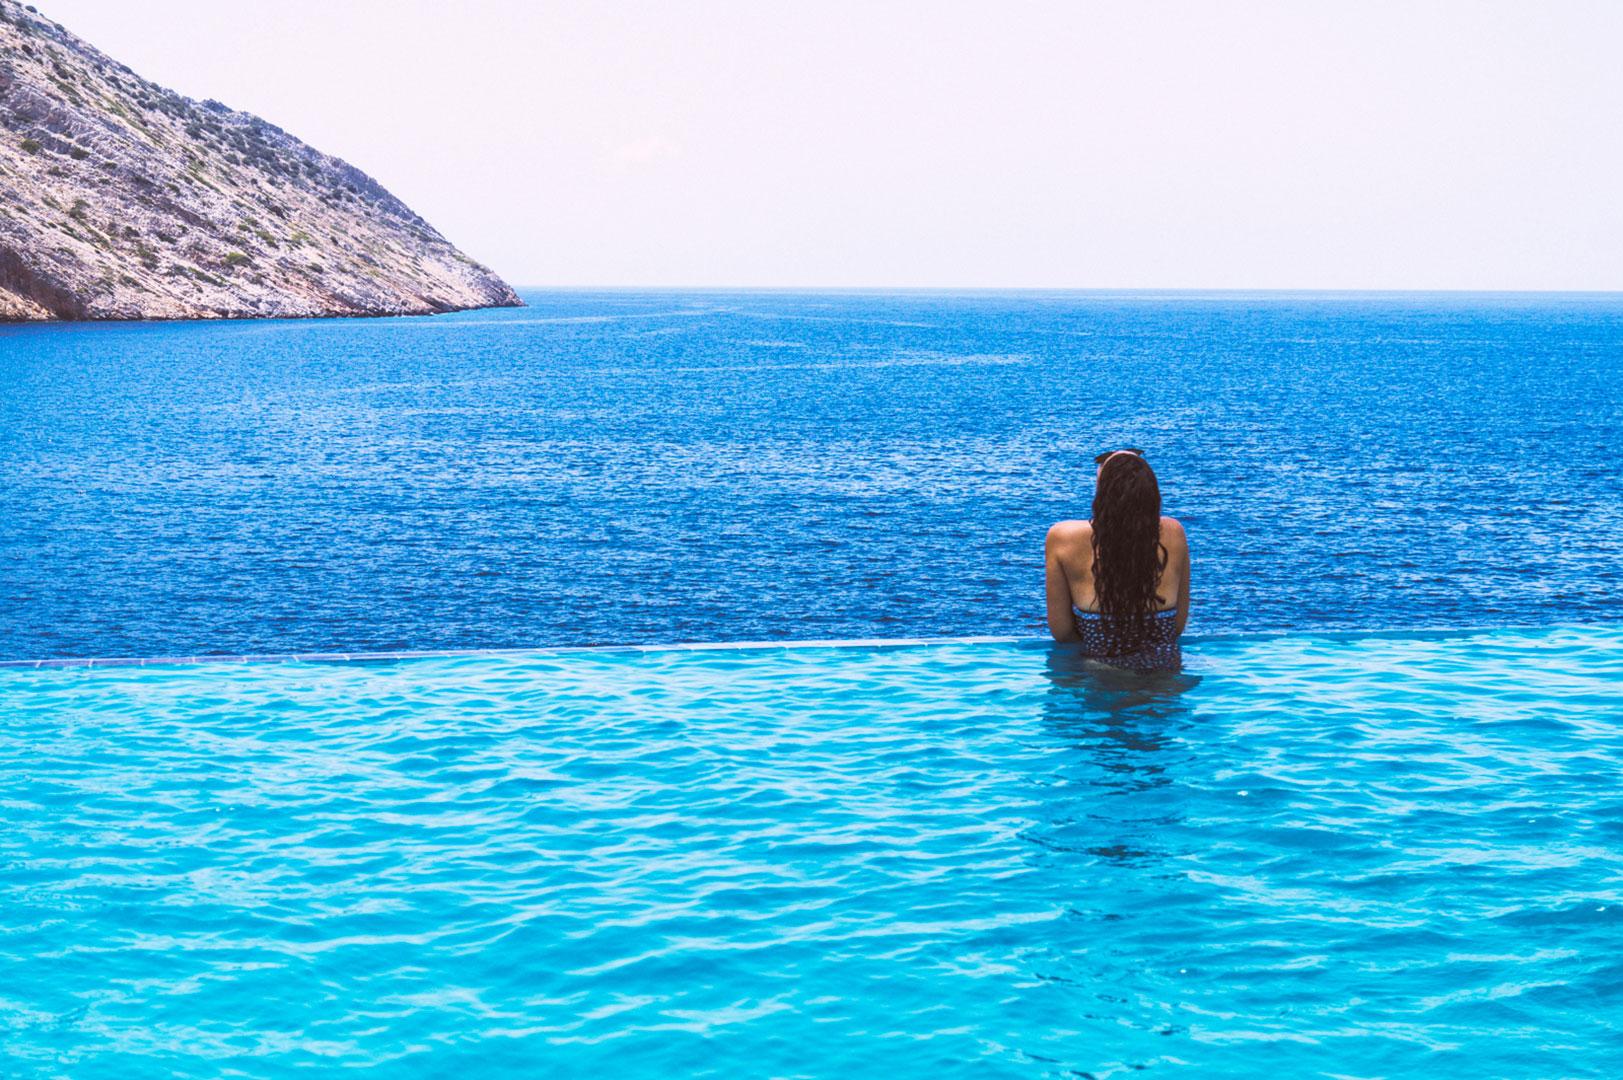 sifnos-greece-la-vie-en-blog-all-rights-reserved-44